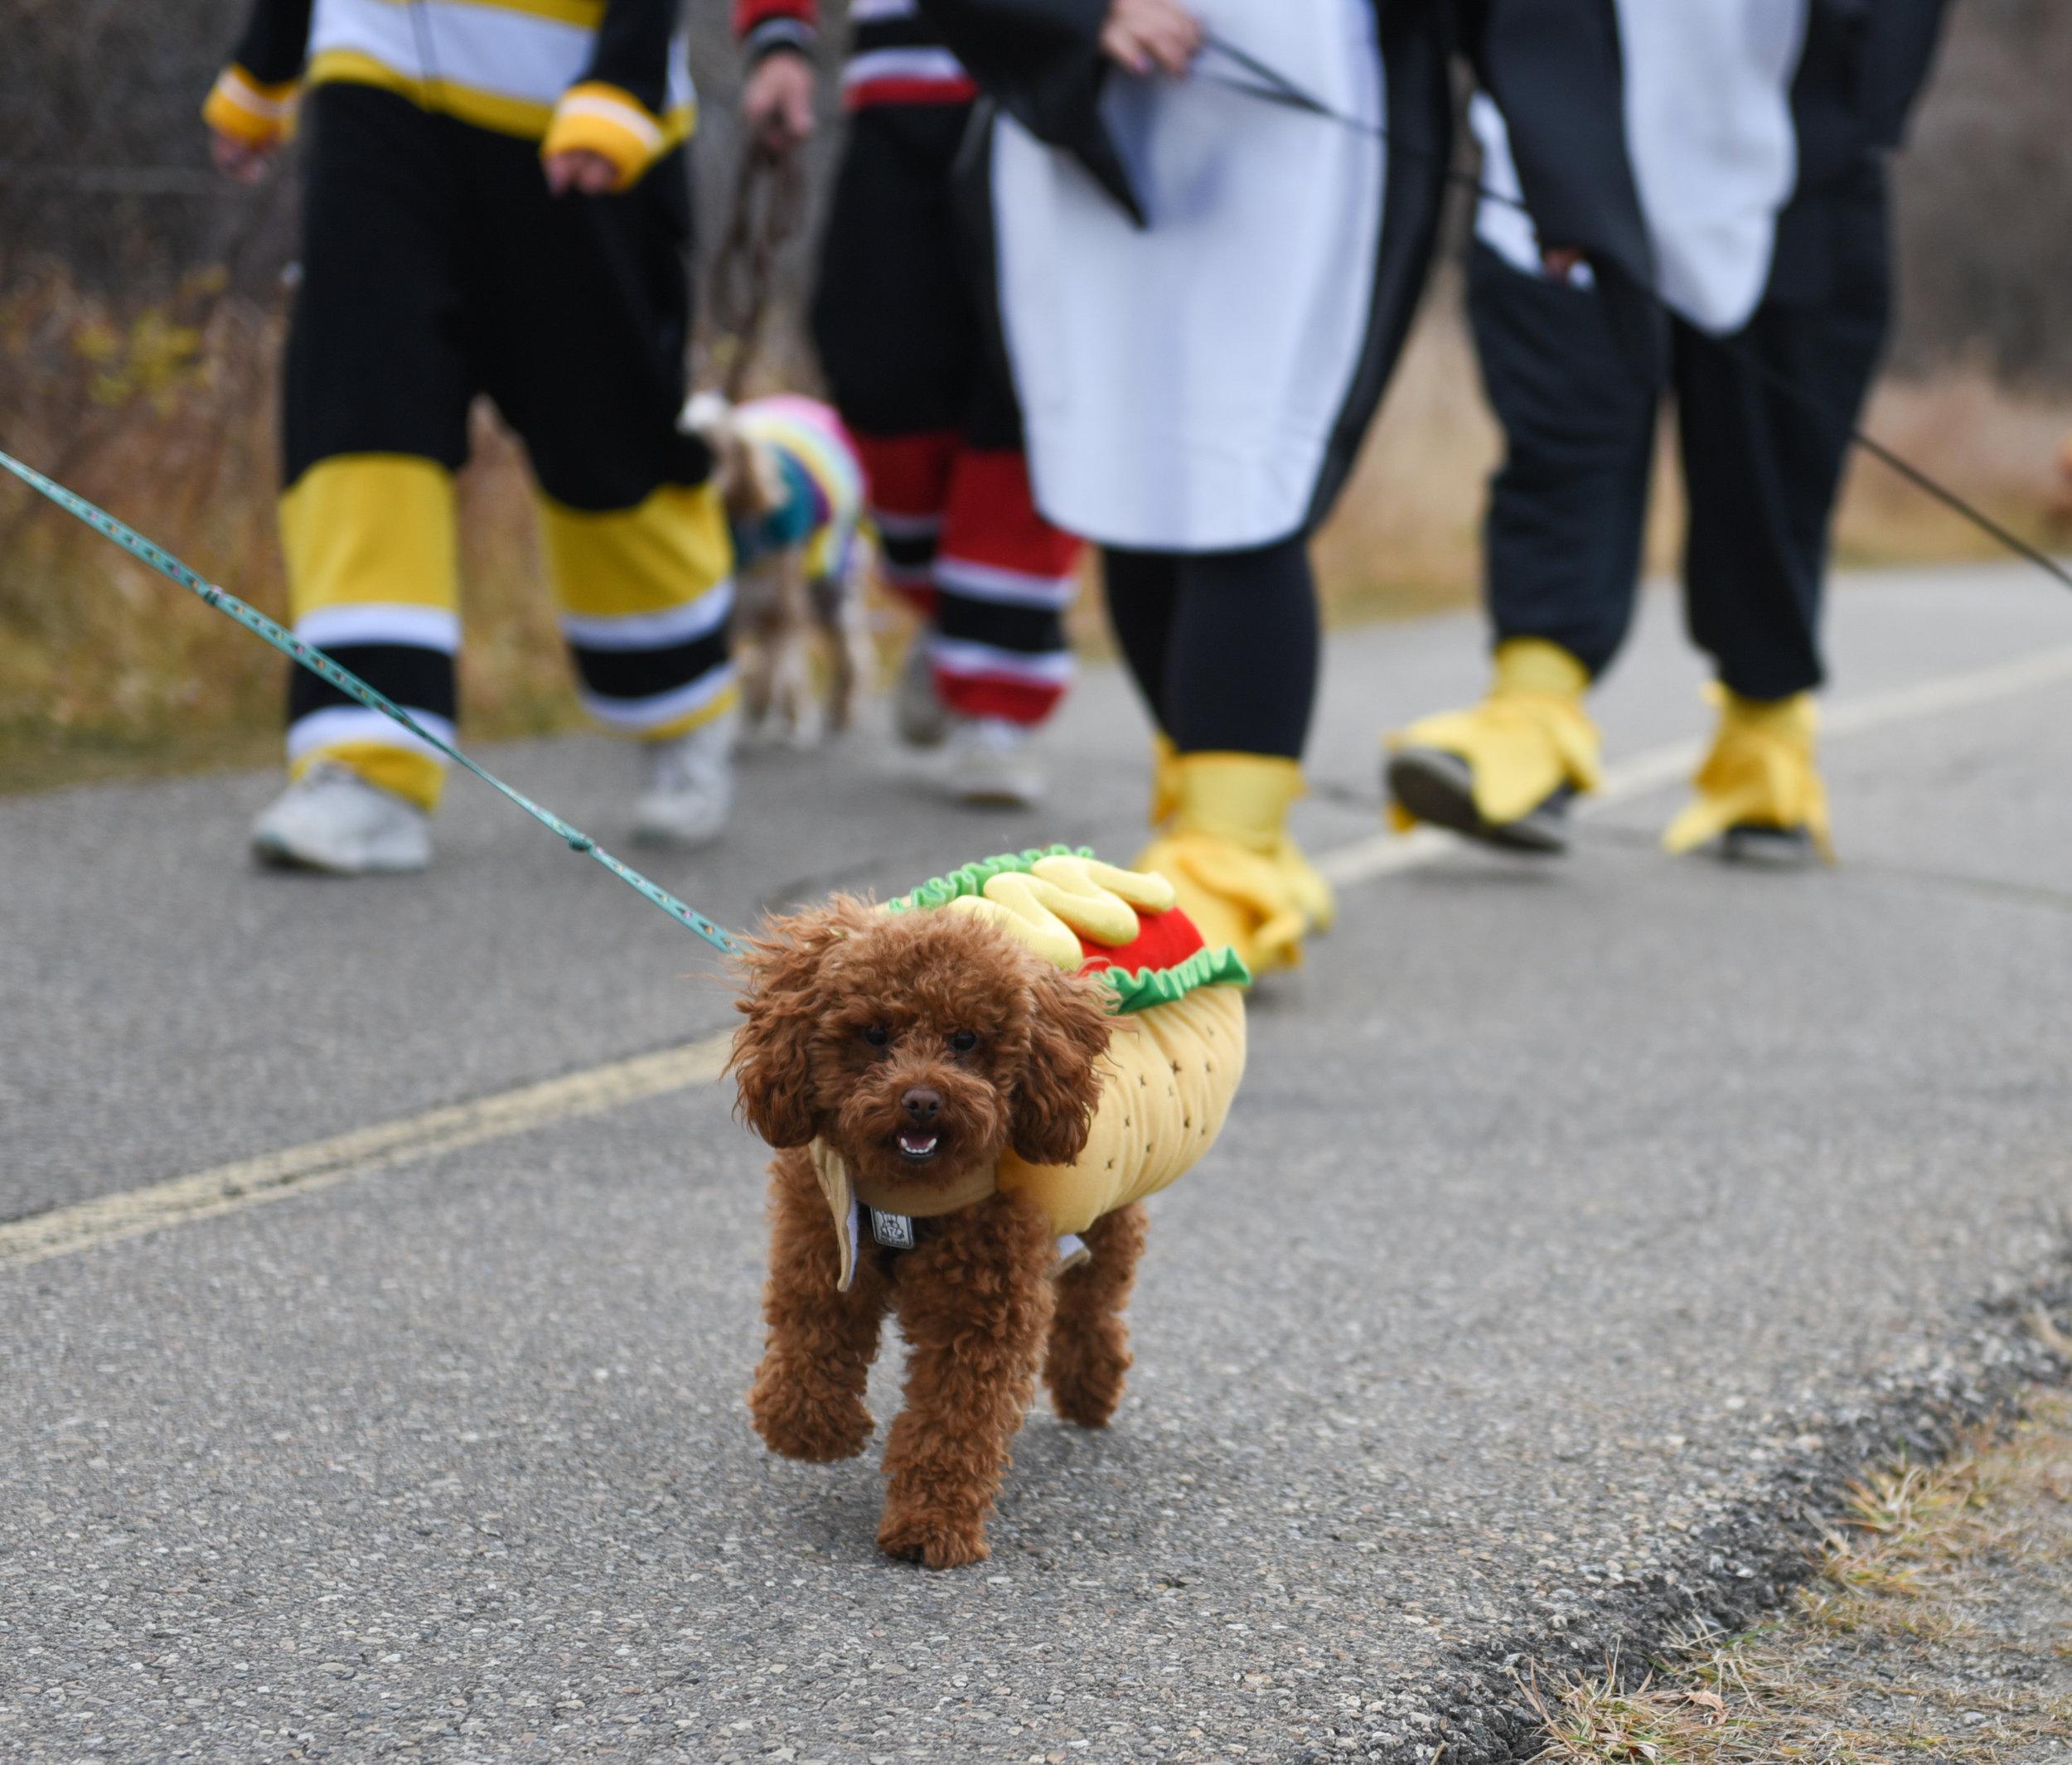 20171027 Tails of Help 2017 Howloween Dog Walk SOT 0189.jpg